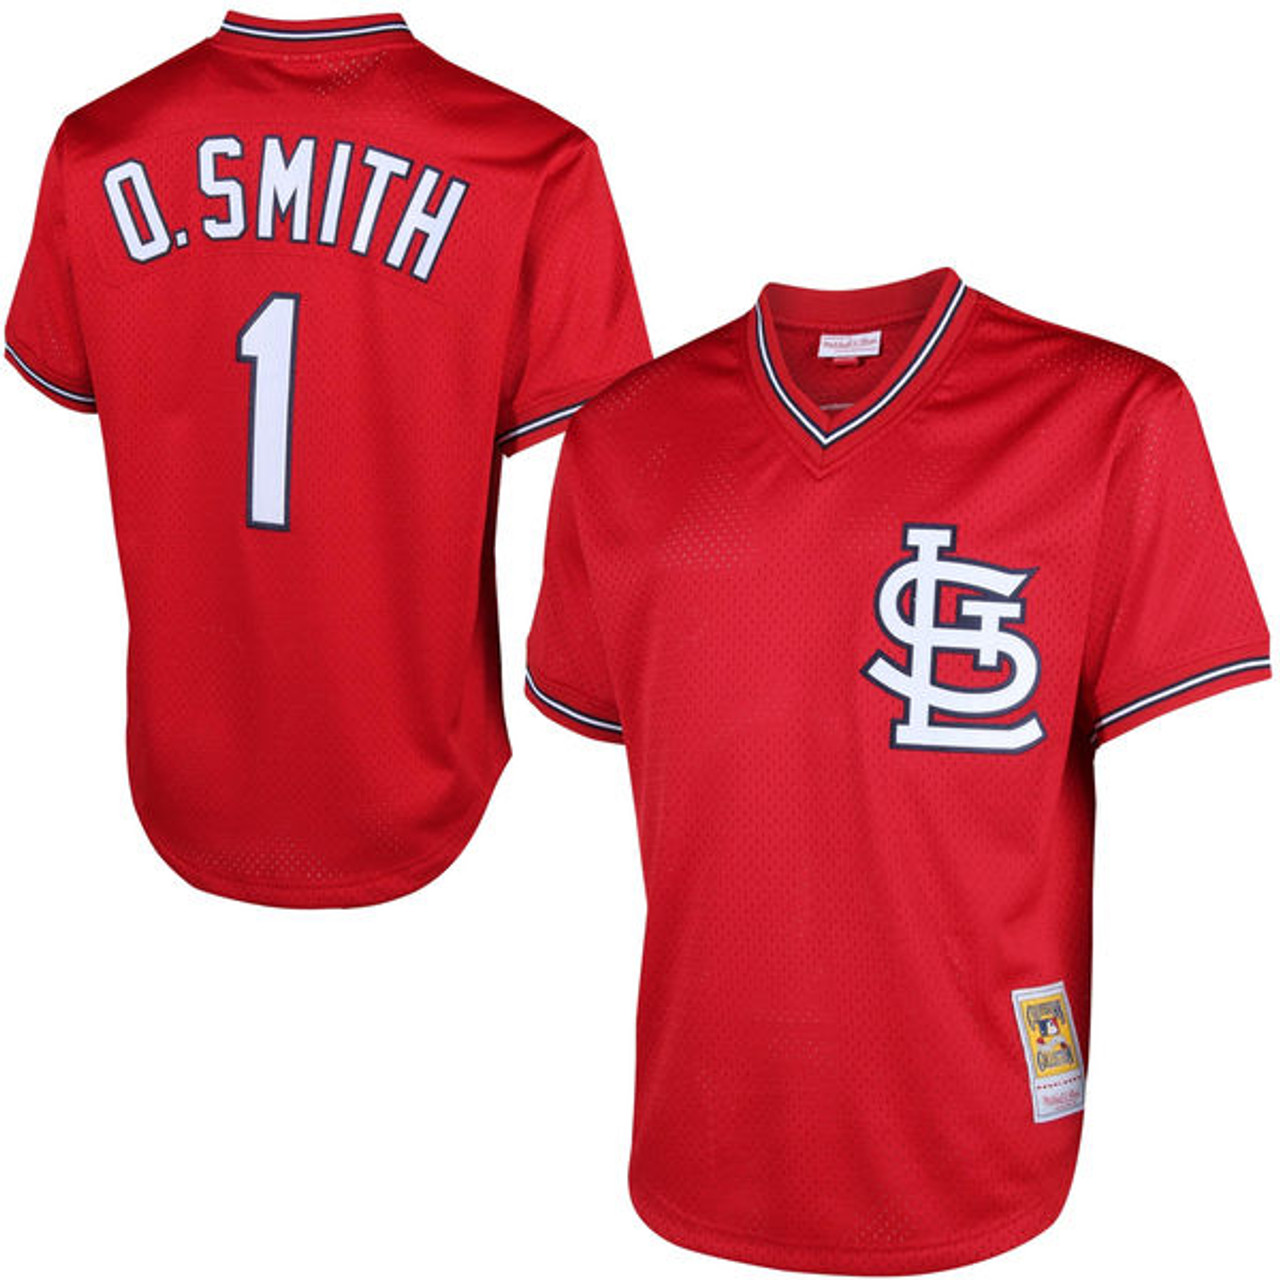 1996 SPx #48 Ozzie St Louis Cardinals béisbol tarjeta Smith